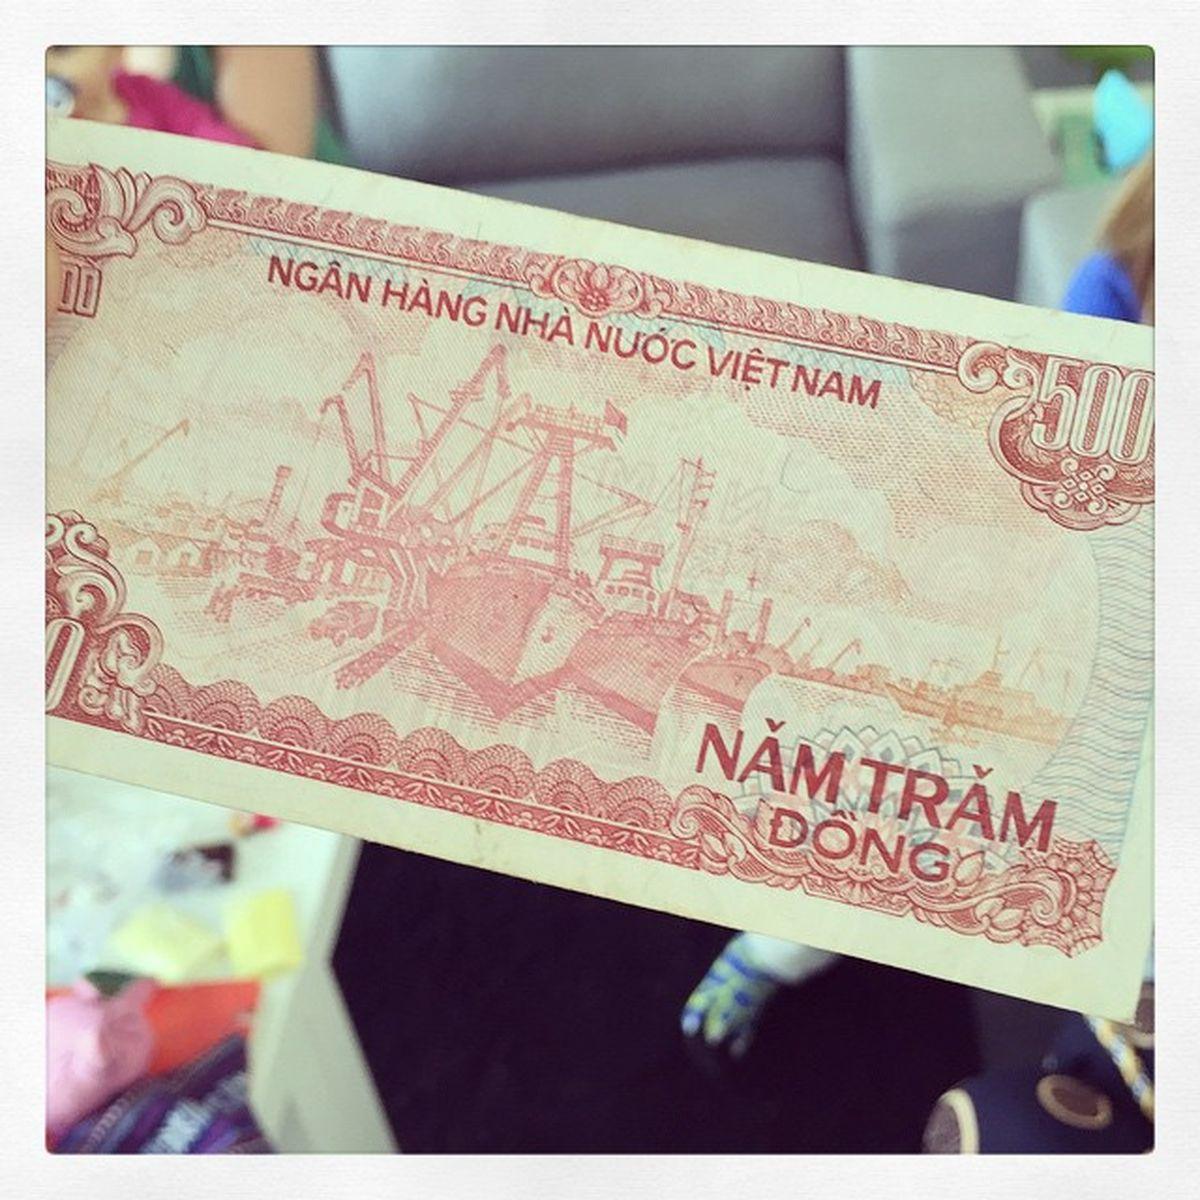 واحد پول ویتنام